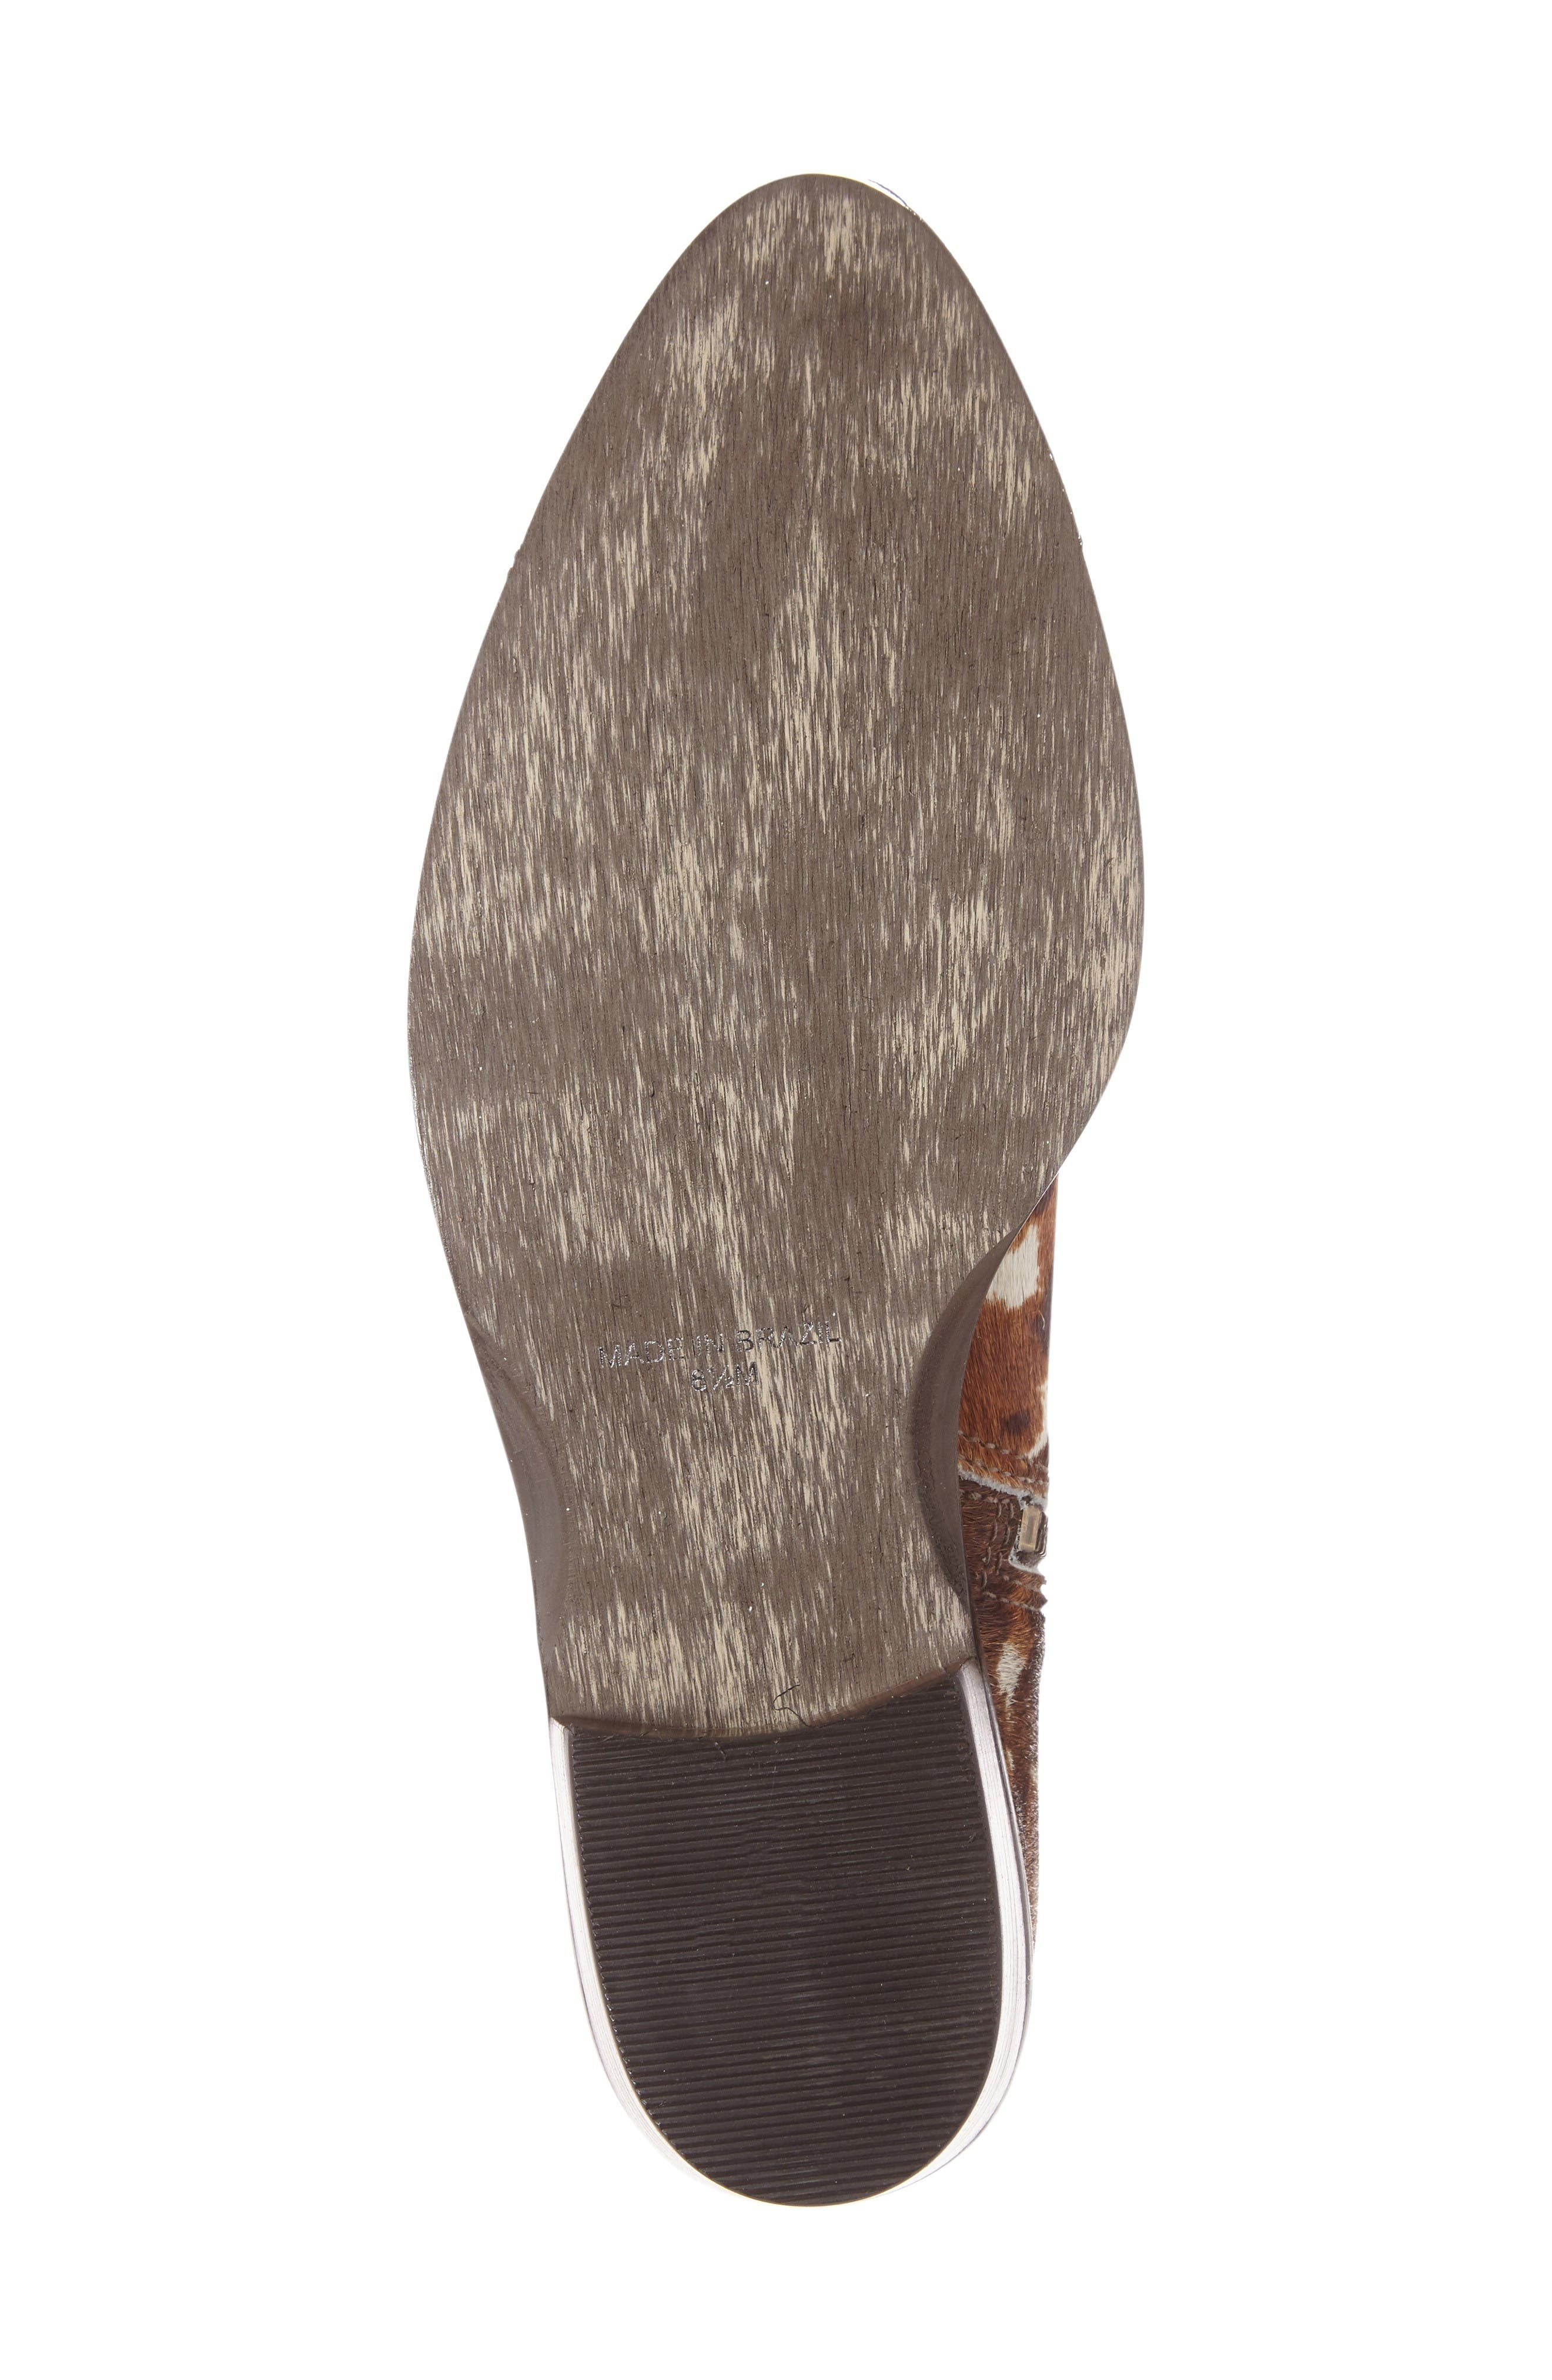 Orlin Genuine Calf Hair Bootie,                             Alternate thumbnail 4, color,                             Multi Spots Calf Hair